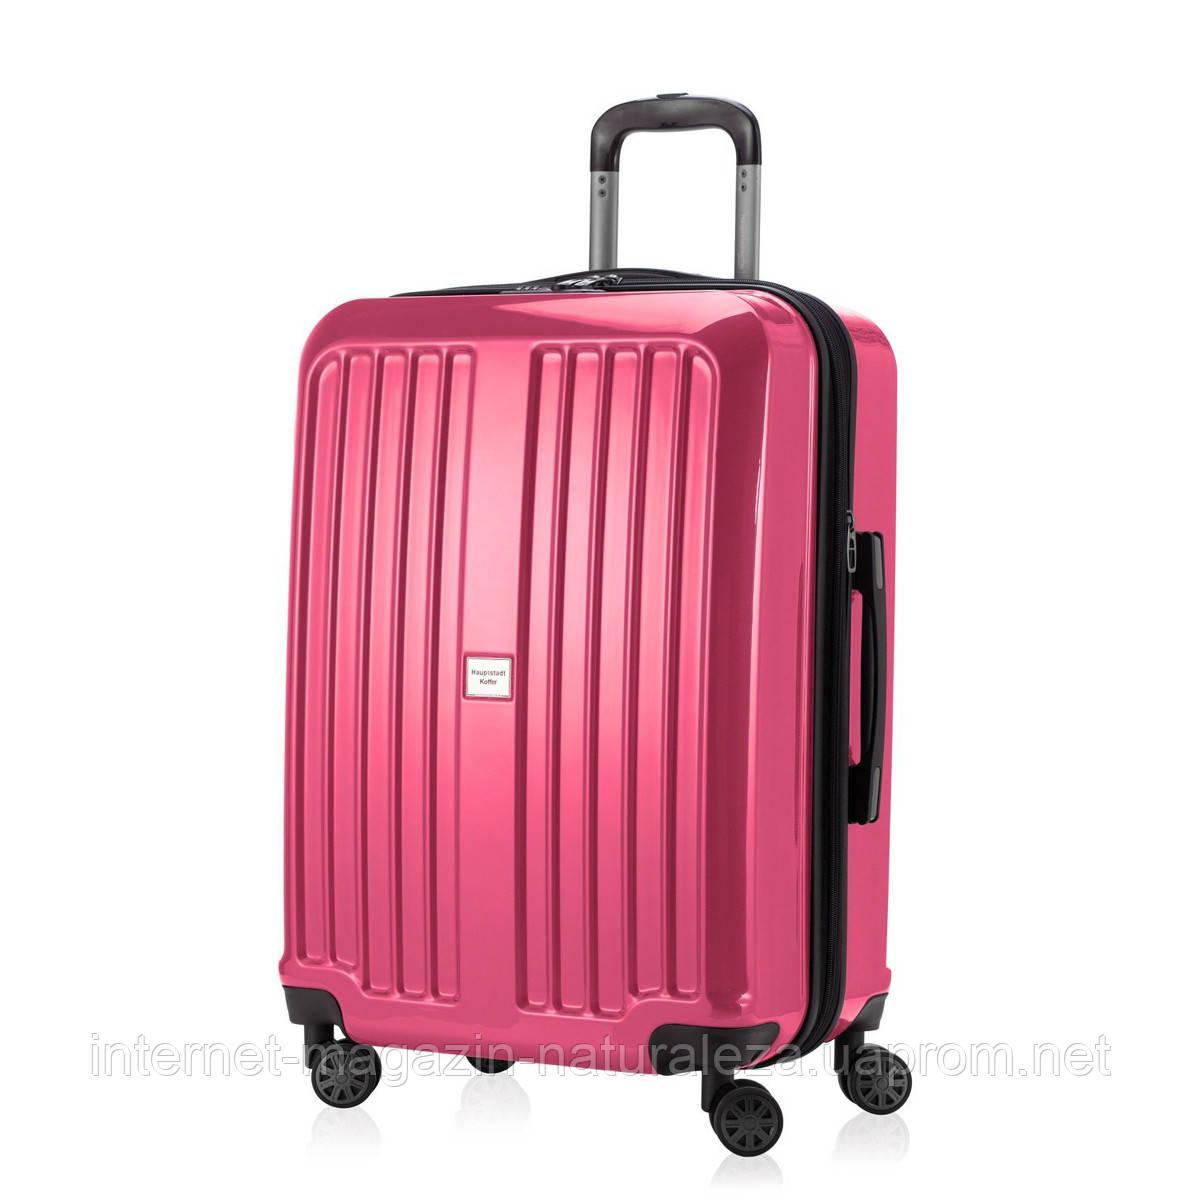 Валіза Hauptstadtkoffer Xbegr Midi рожевий